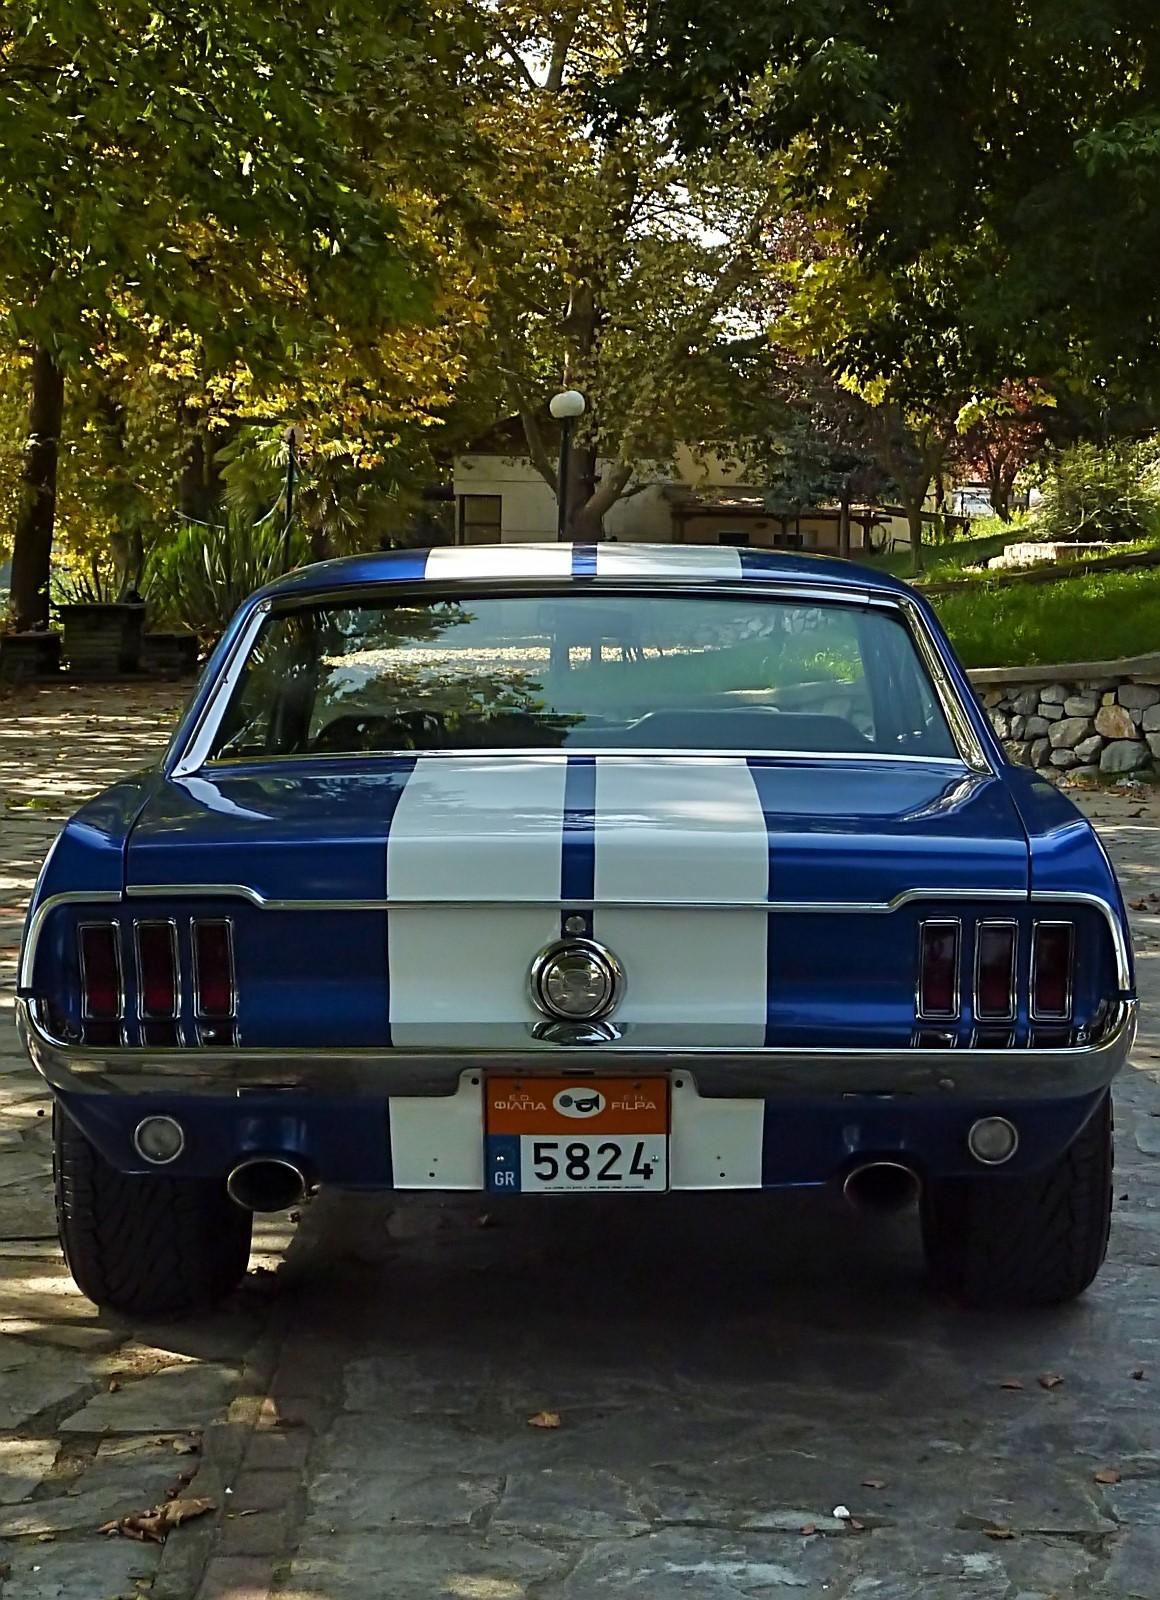 1968 Ford Mustang 289 (79).jpg